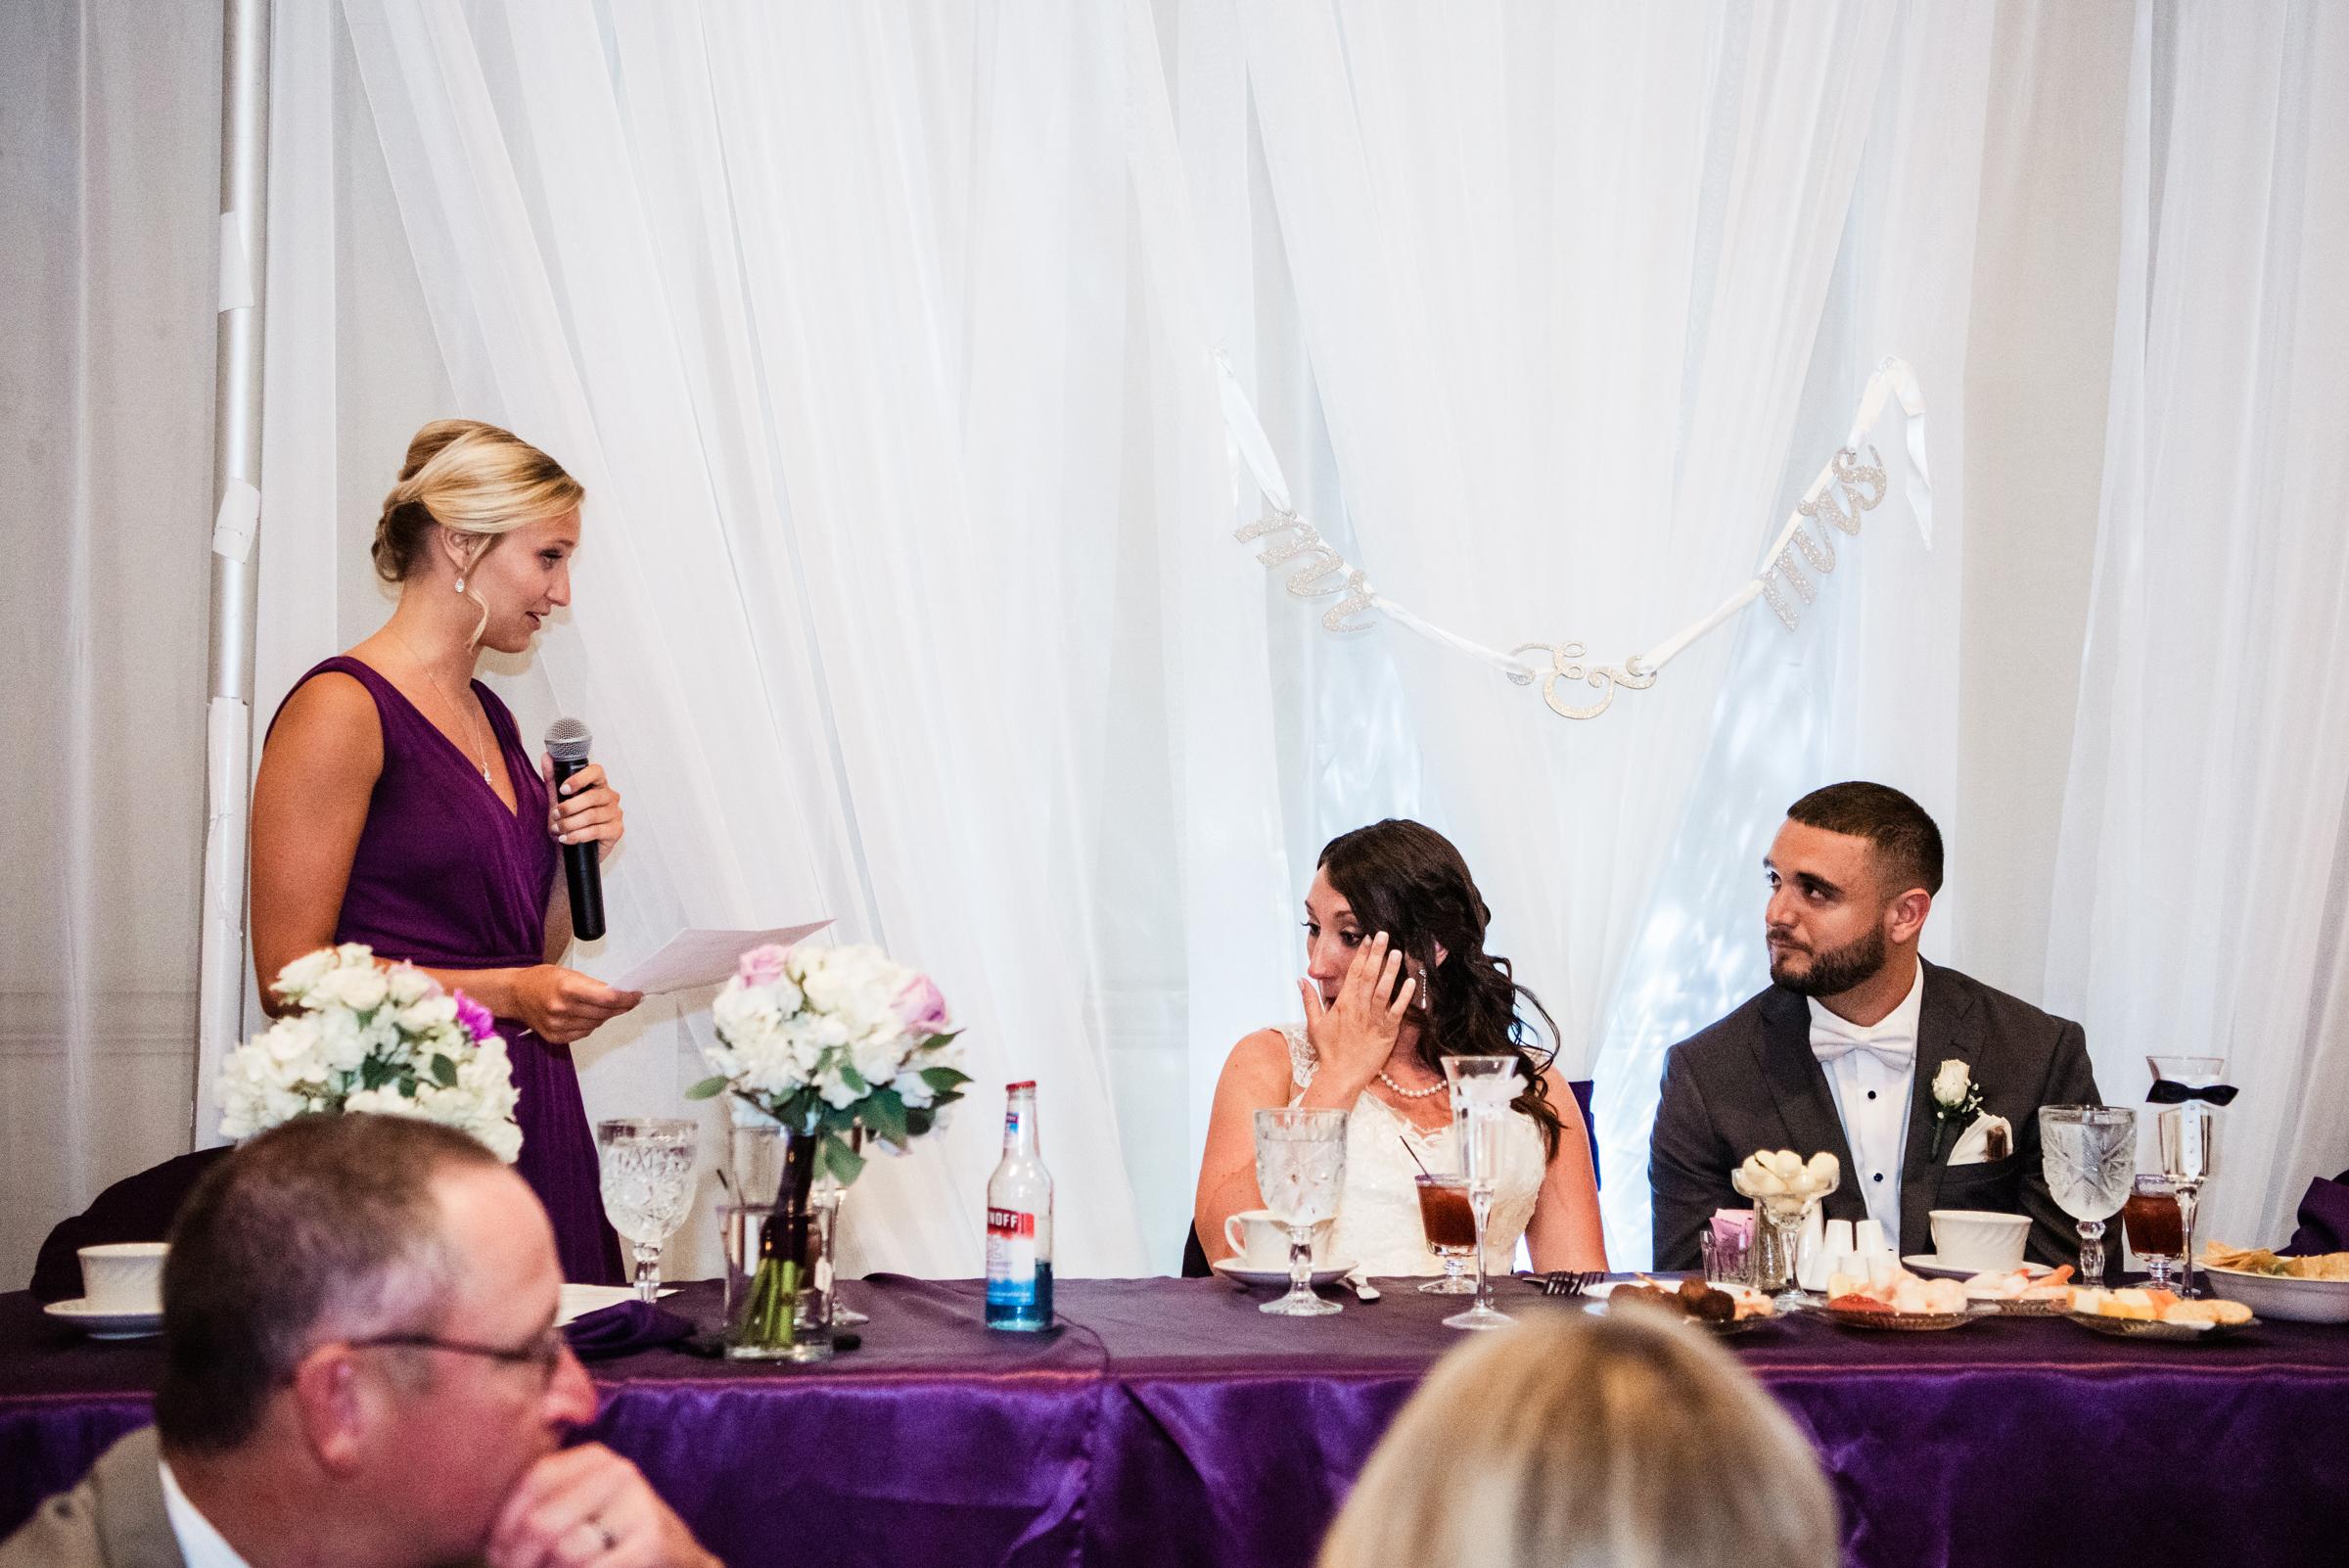 Historic_Old_St_Johns_Church_Valentinos_Banquet_Hall_Central_NY_Wedding_JILL_STUDIO_Rochester_NY_Photographer_DSC_6825.jpg